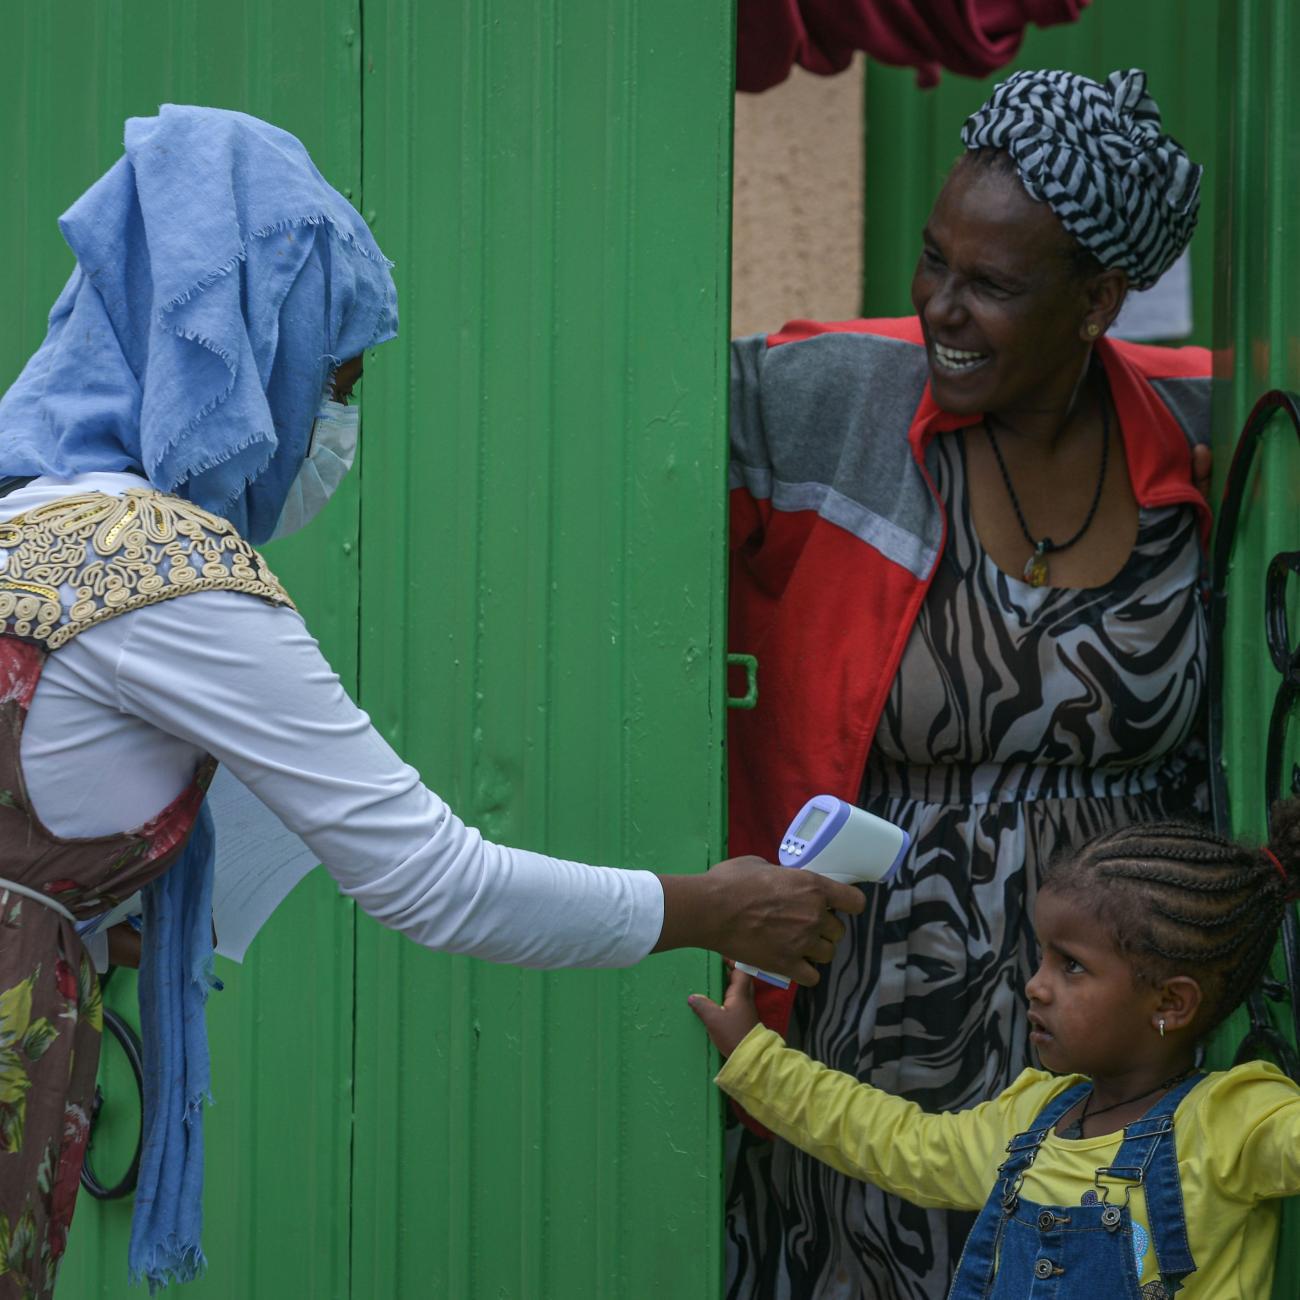 https://www.thinkglobalhealth.org/sites/default/files/styles/max_1300x1300_1_1/public/2020-11/Tadesse.Ethiopia.Resilience.Header.1x1.jpg?itok=ICZuC4YB